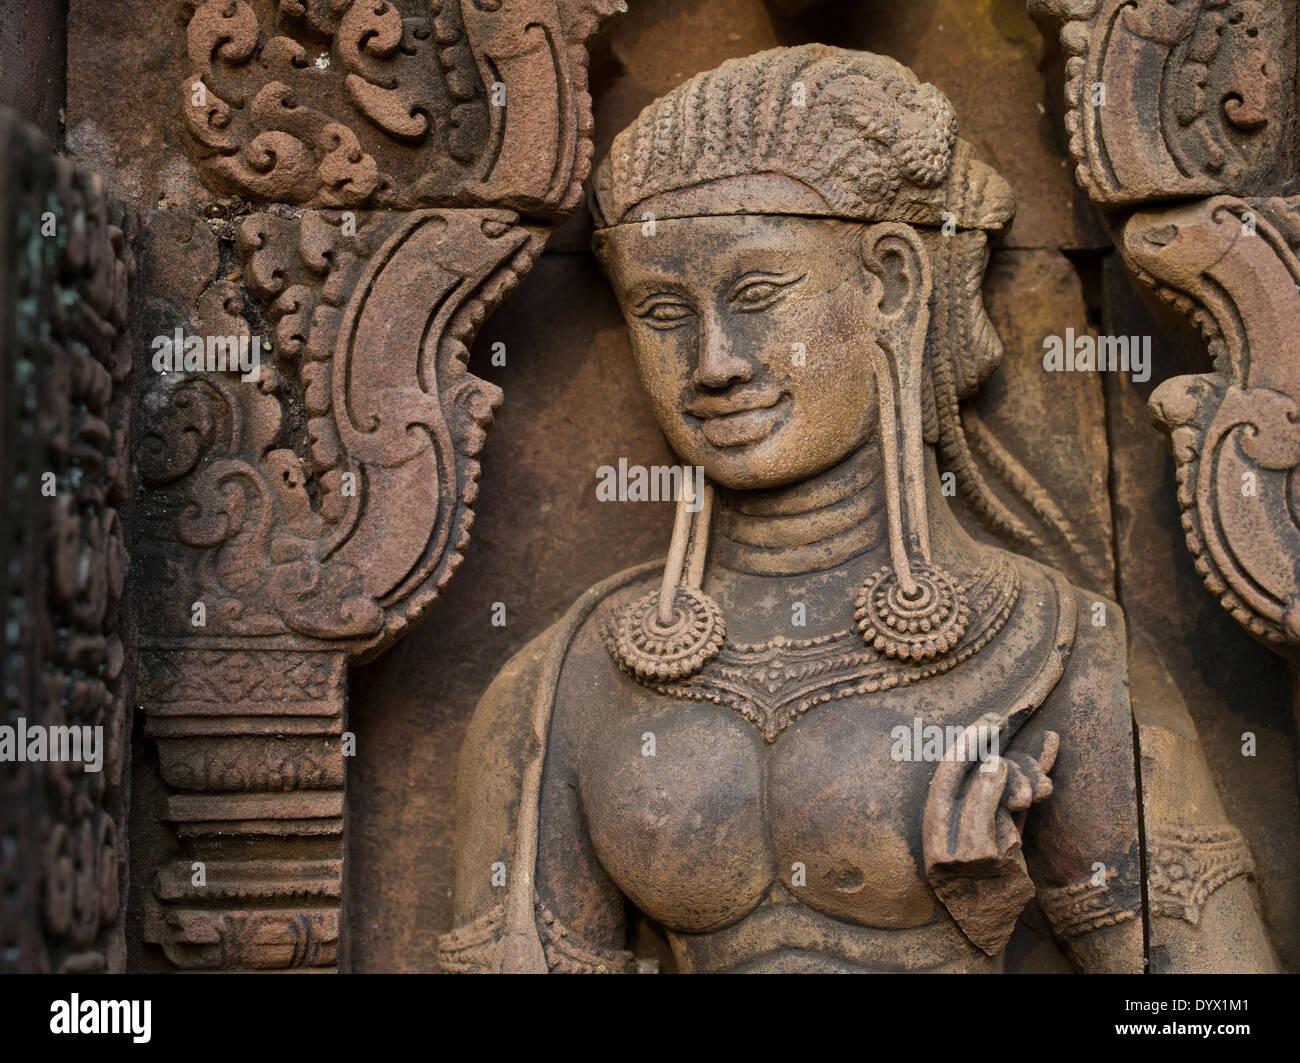 Apsara Carving at Banteay Srei Hindu Temple dedicated to Shiva. Siem Reap, Cambodia - Stock Image